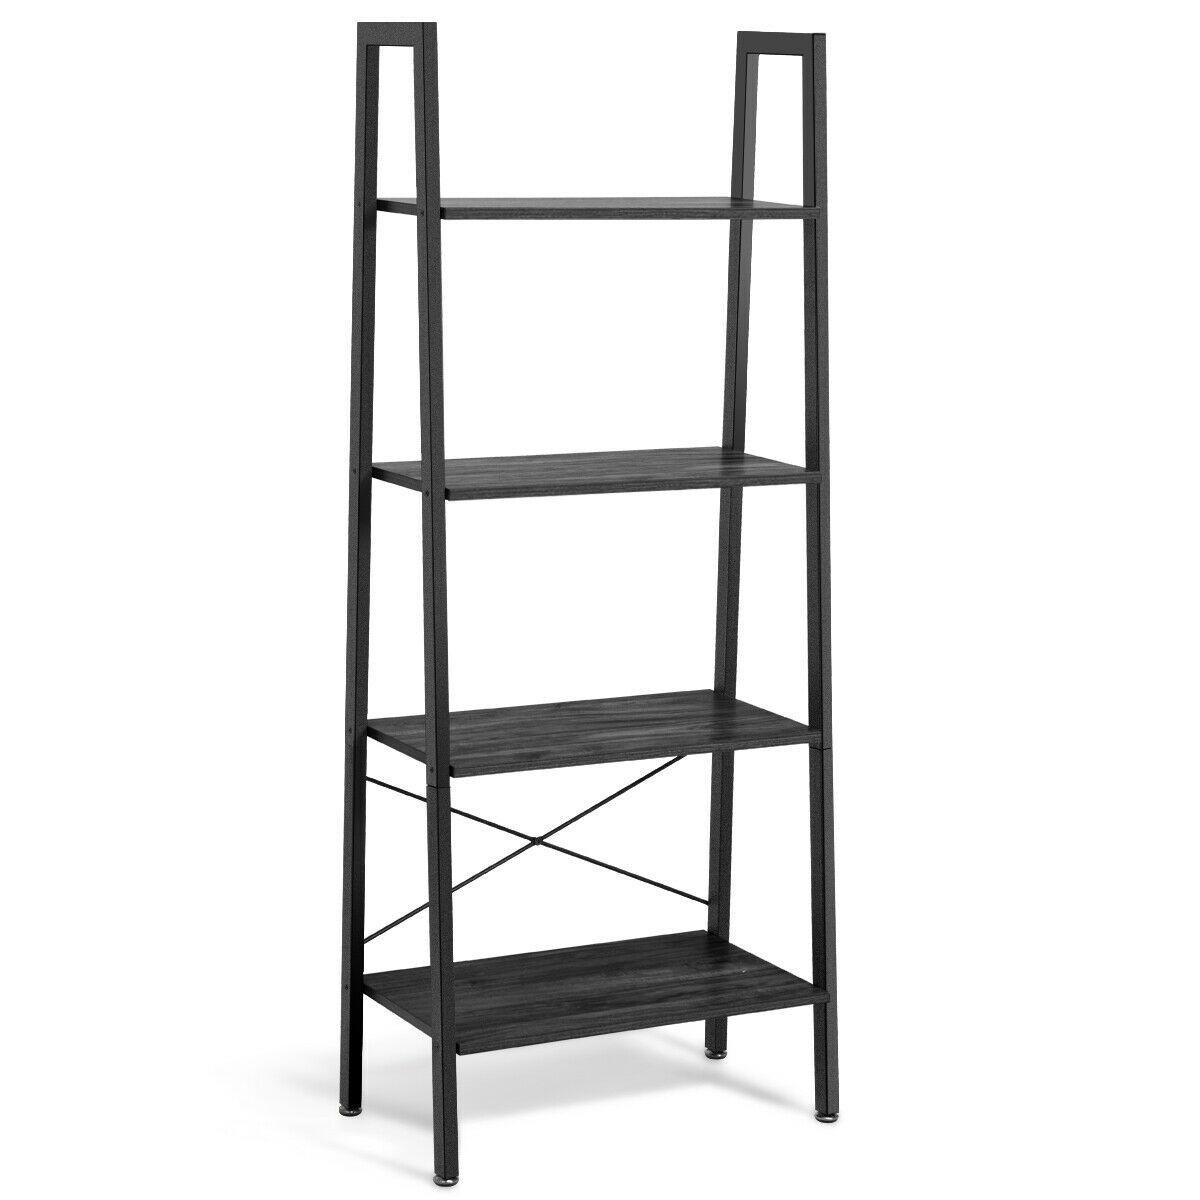 4 Tier Ladder Shelf Bookcase Bookshelf Display Rack Plant Stand